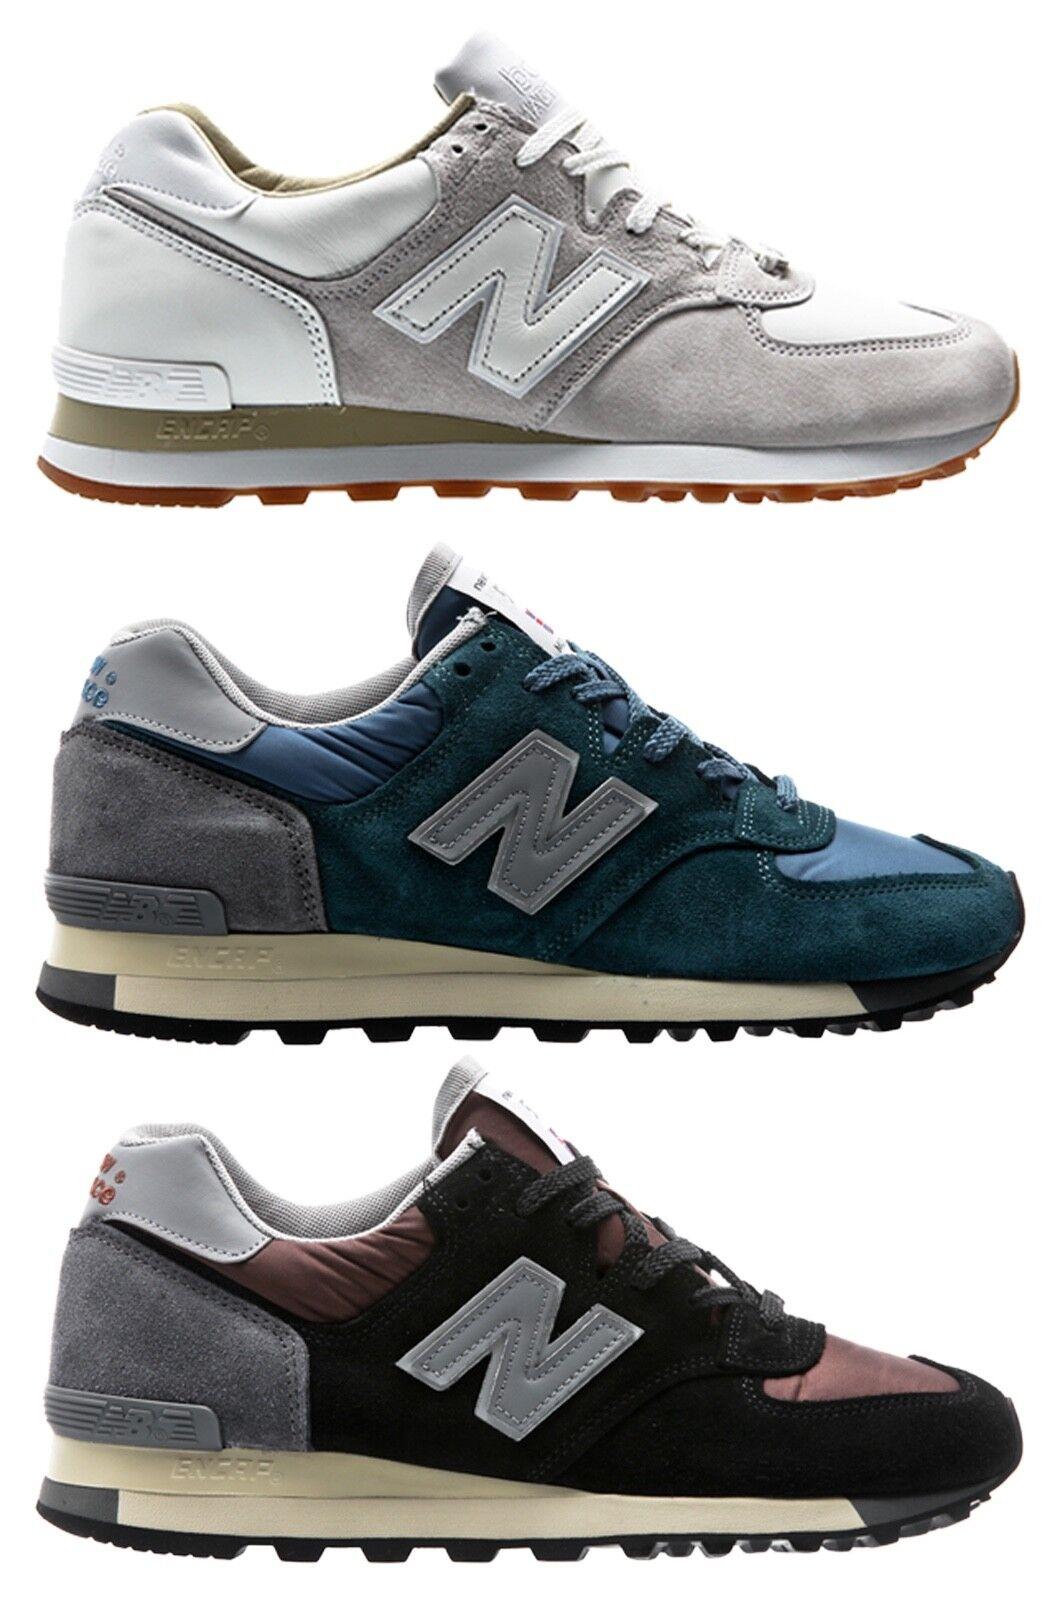 New Balance M575 575 End SNB SNR MEN SNEAKER MEN SHOES Running Shoe